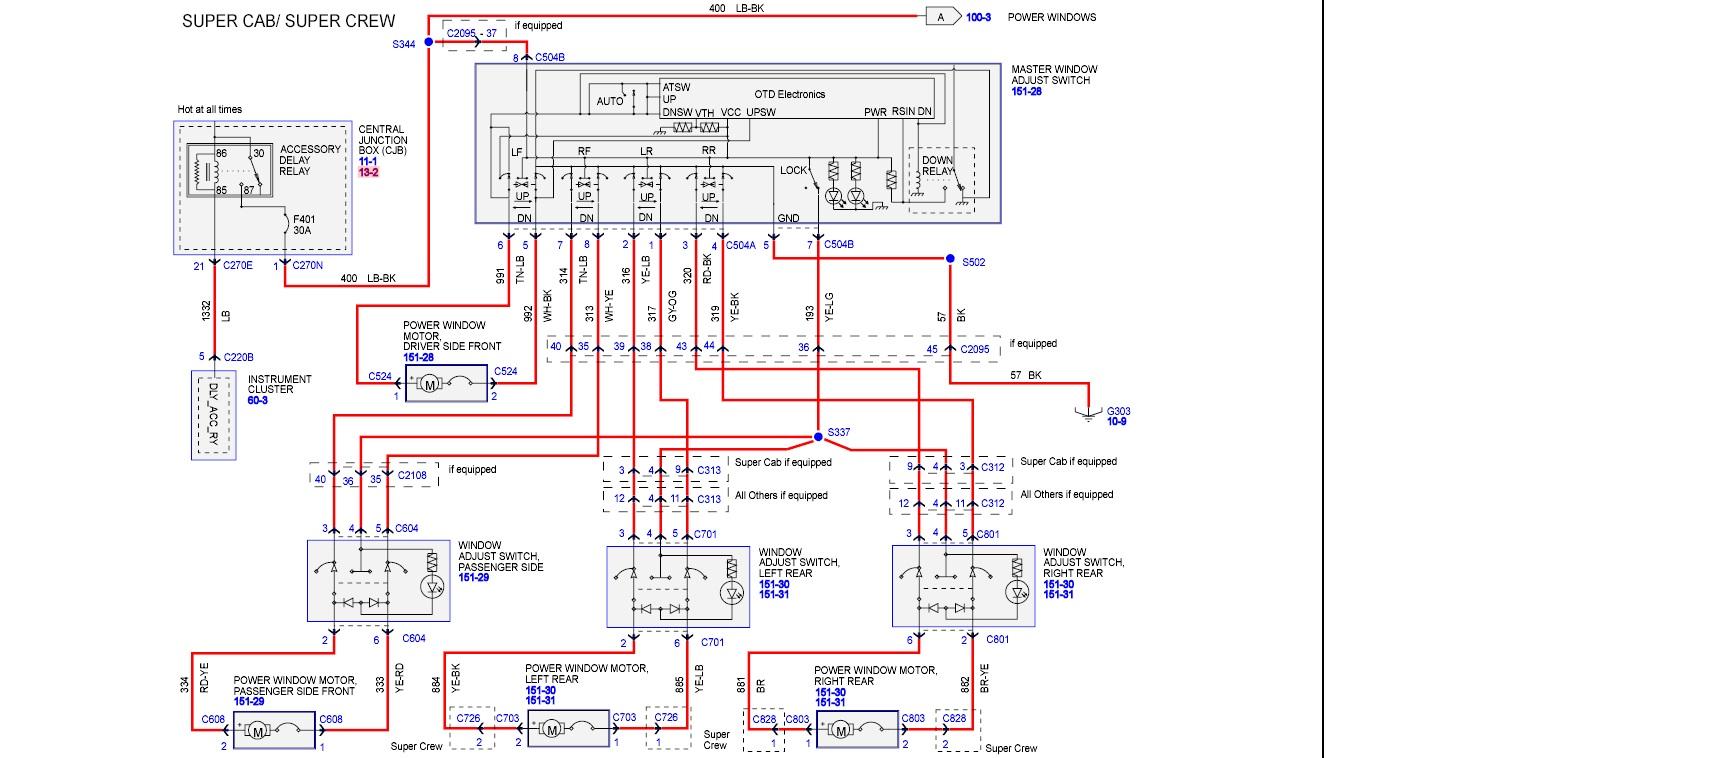 Magnificent 2004 F150 Wiring Diagram Wiring Diagram Floraoflangkawi Org Wiring Cloud Xortanetembamohammedshrineorg